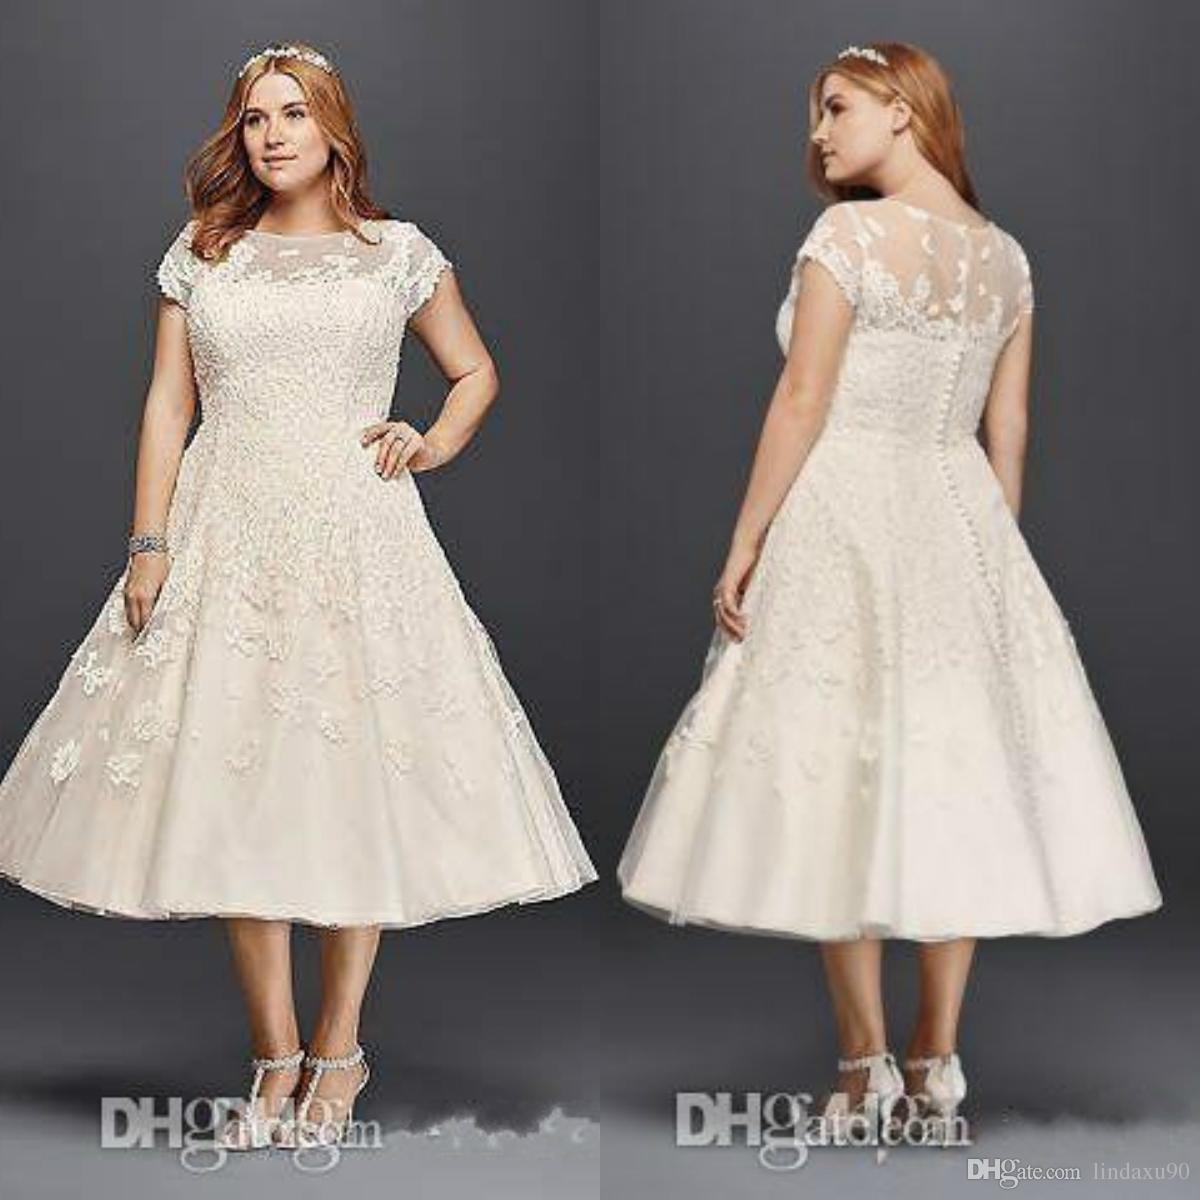 Vintage Tea Length Wedding Dresses Plus Size A Line 2019 Garden Outdoor  Oleg Cassini Short Sleeve Holiday Beach Sheer Back Bridal Gowns